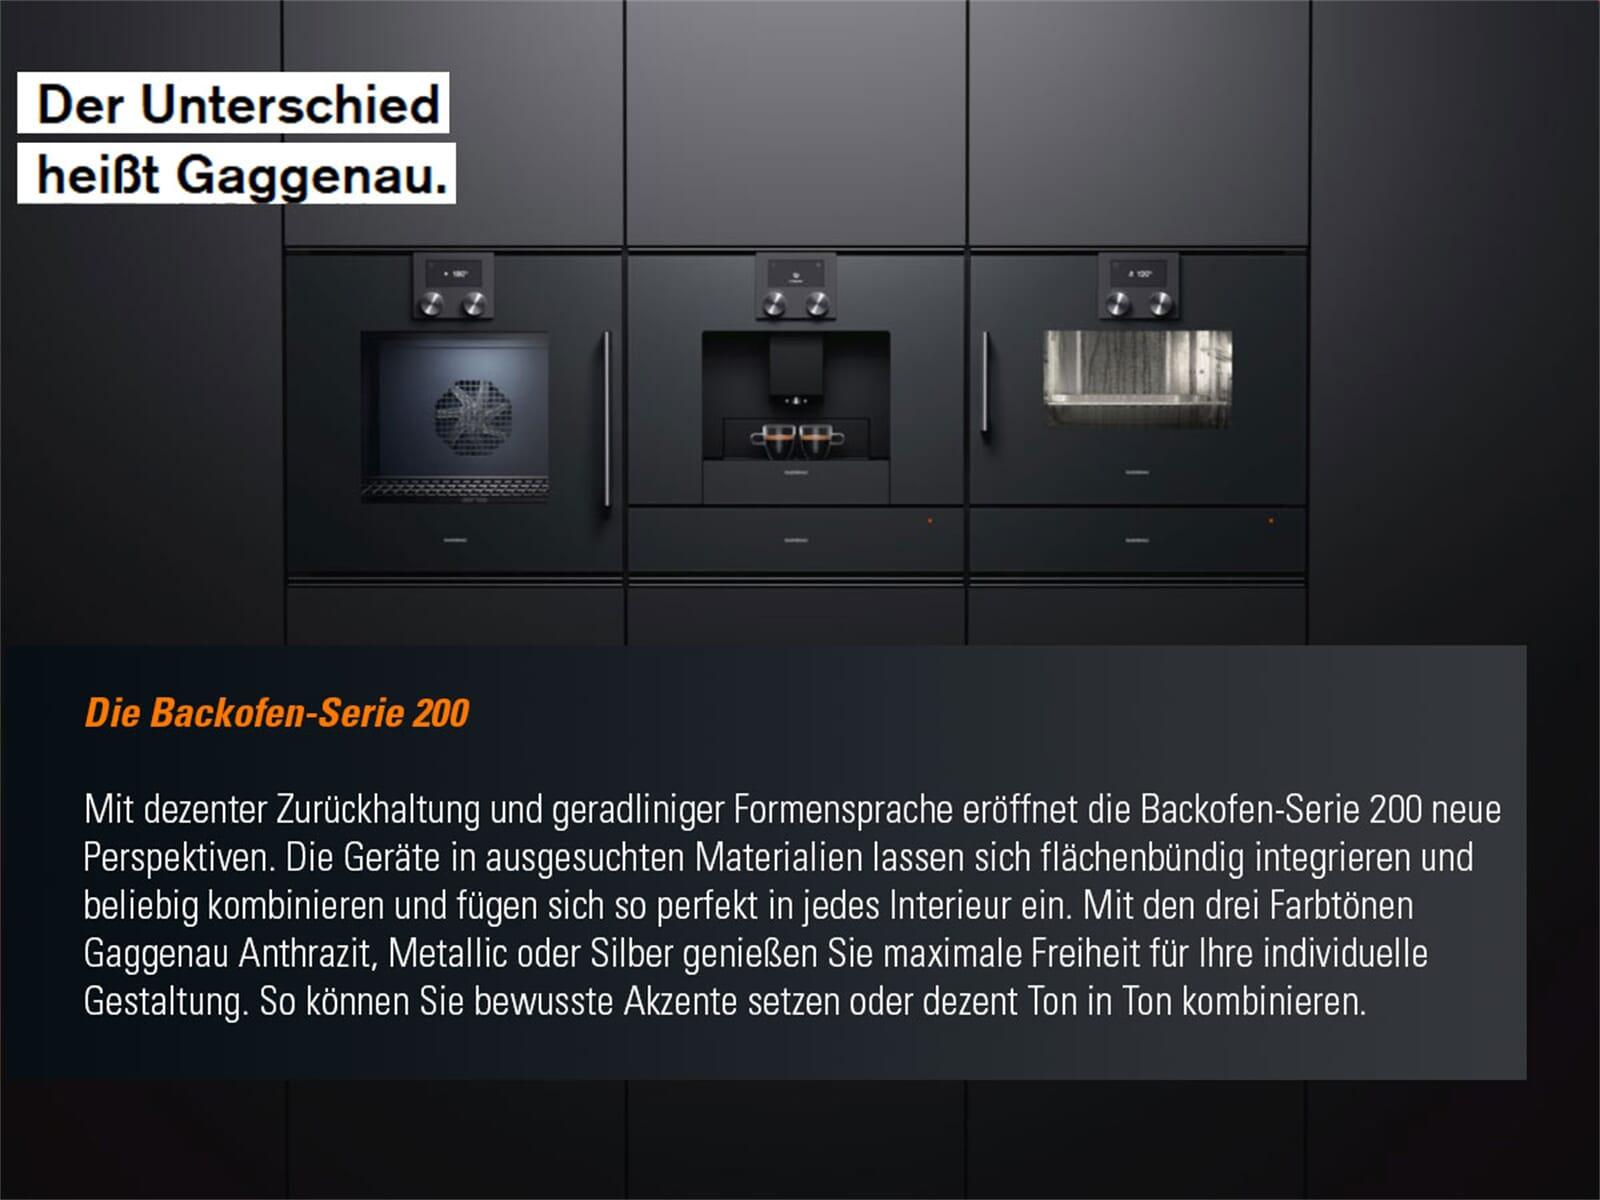 Gaggenau BOP 211 102 Backofen Serie 200 Anthrazit